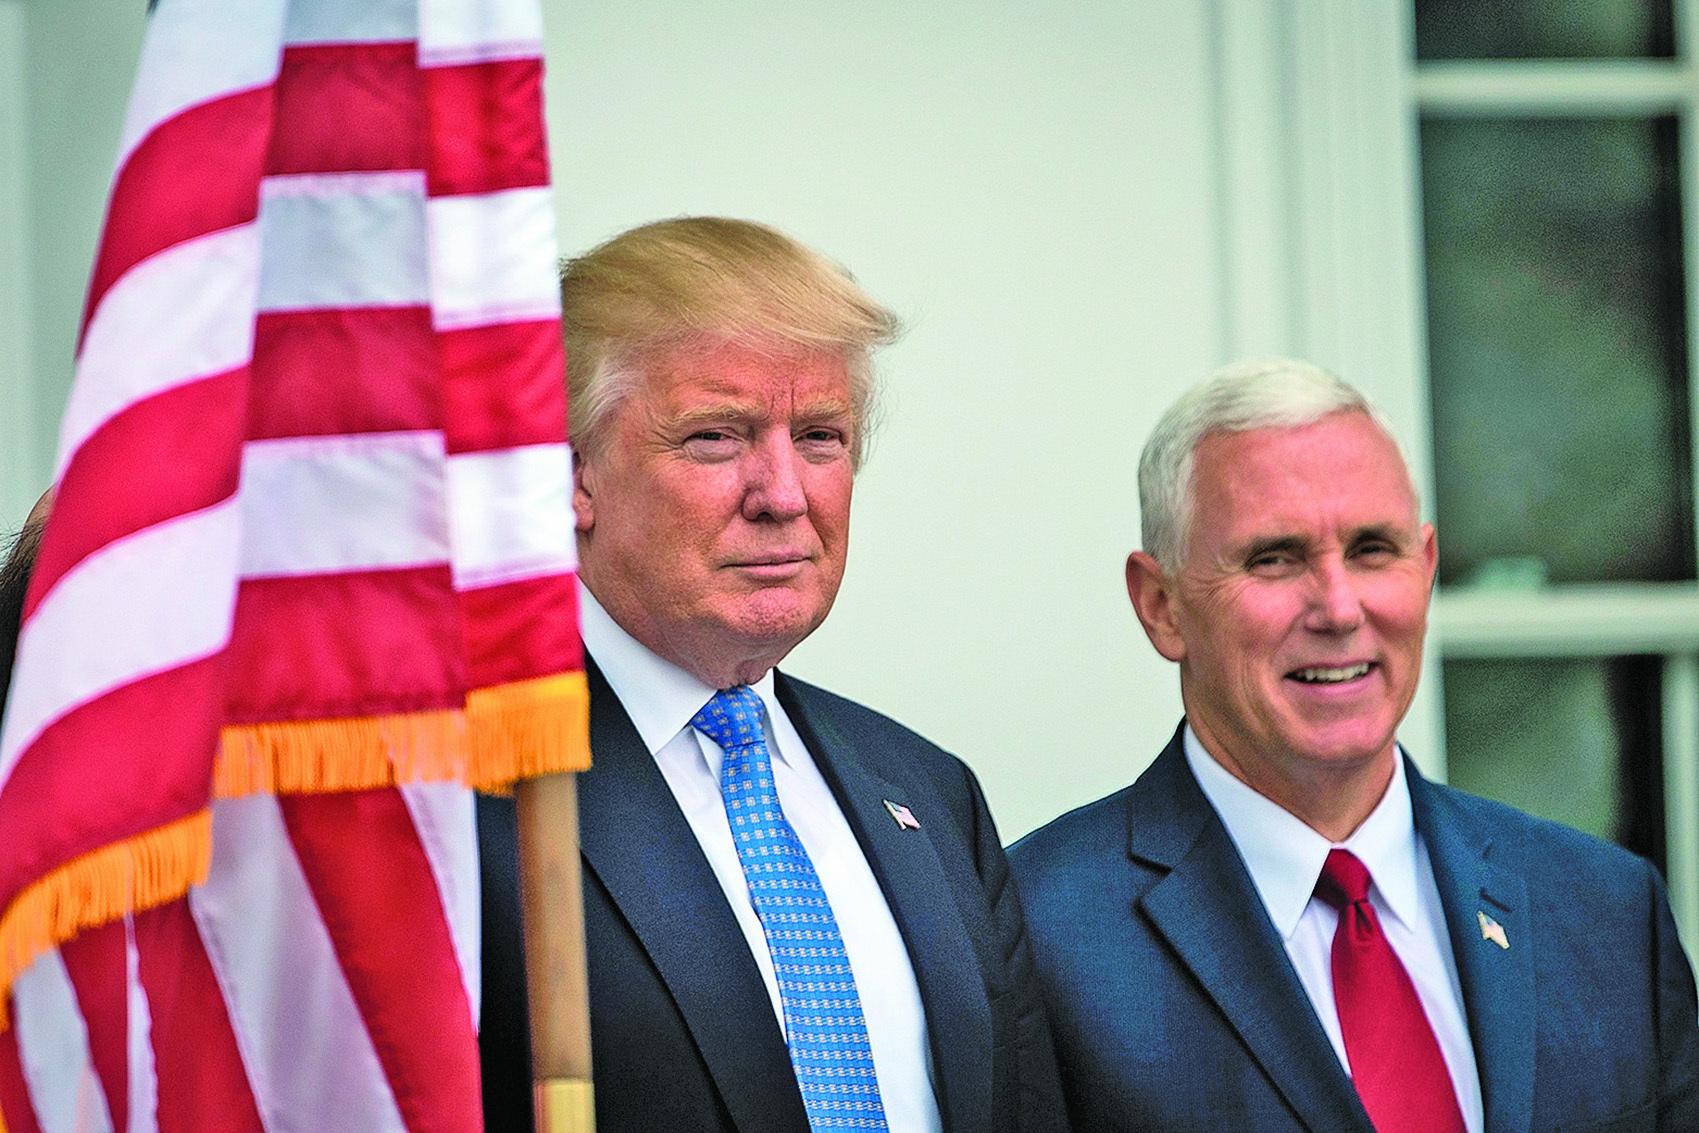 圖為美國總統特朗普(左)與副總統彭斯。(Drew Angerer/Getty Images)